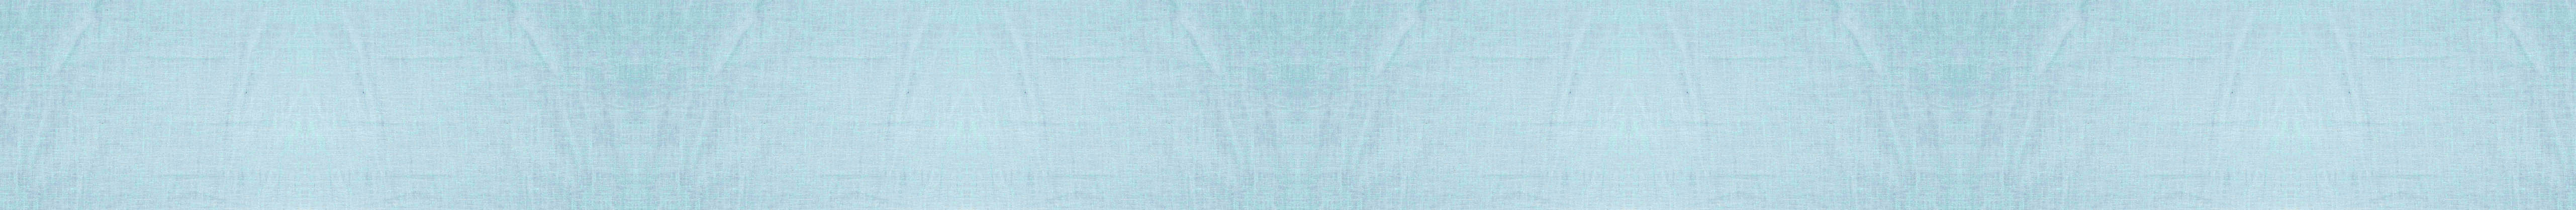 banner-linos